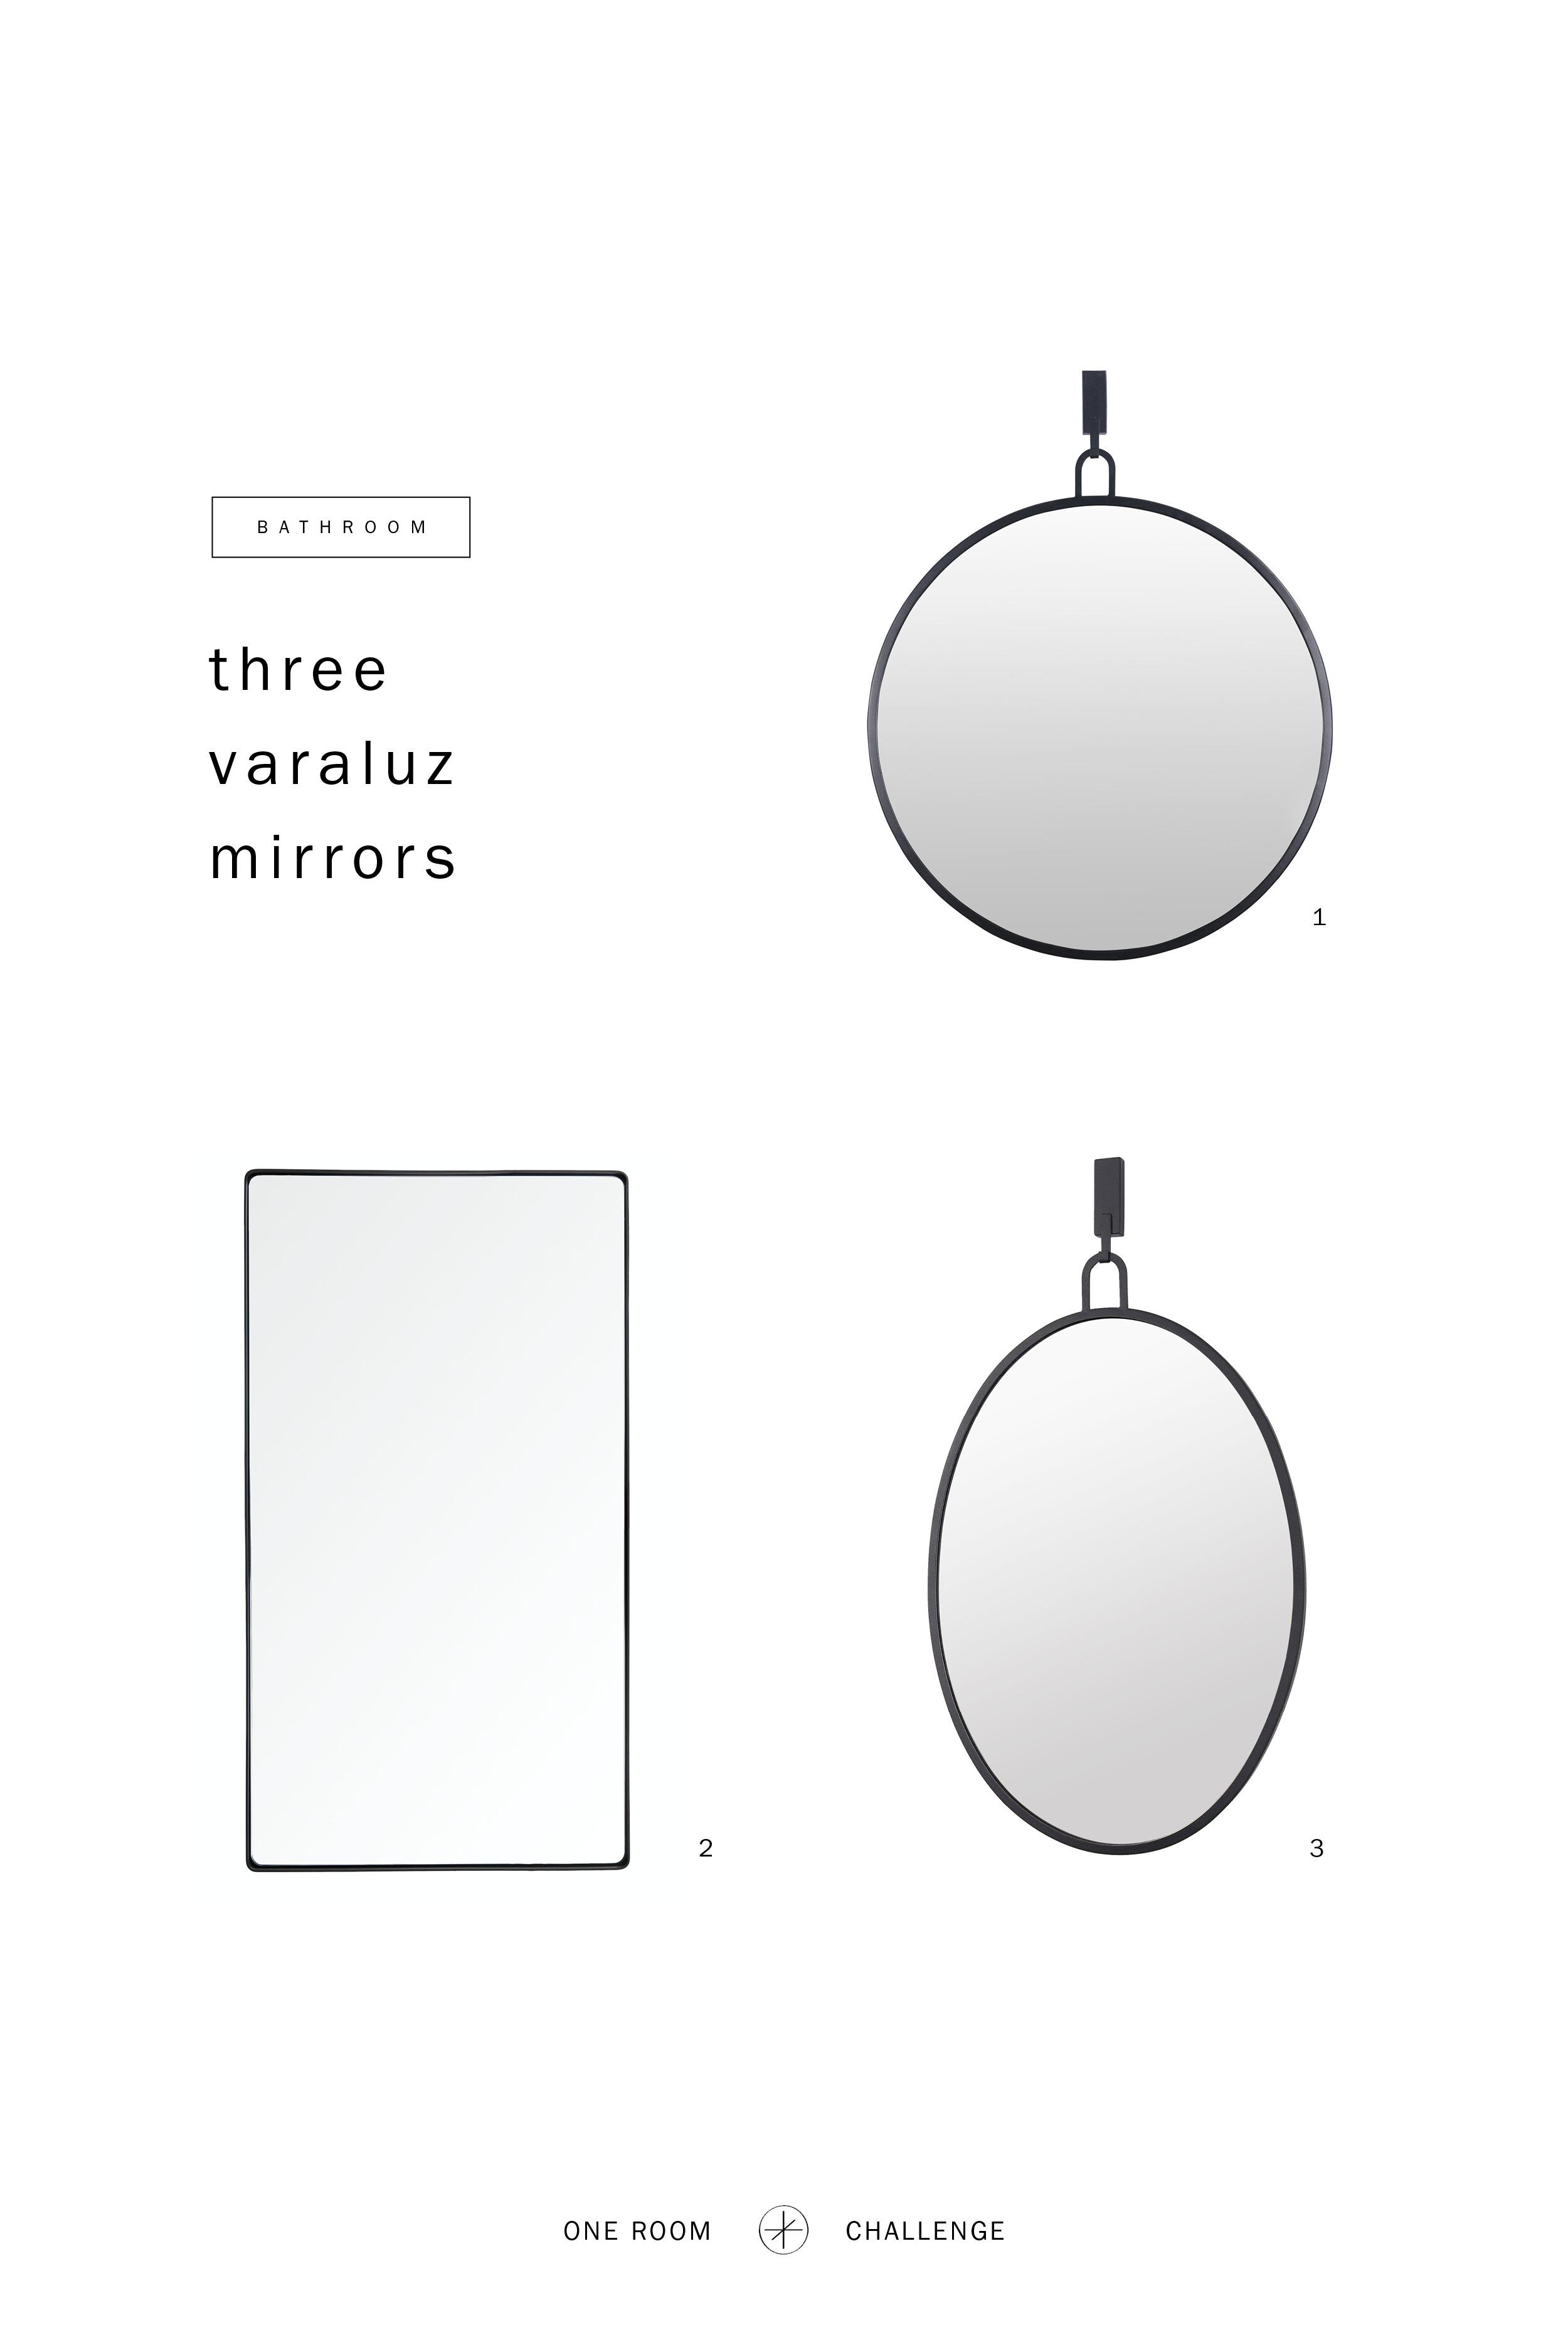 Casework_Varaluz_Bathroom_Mirror